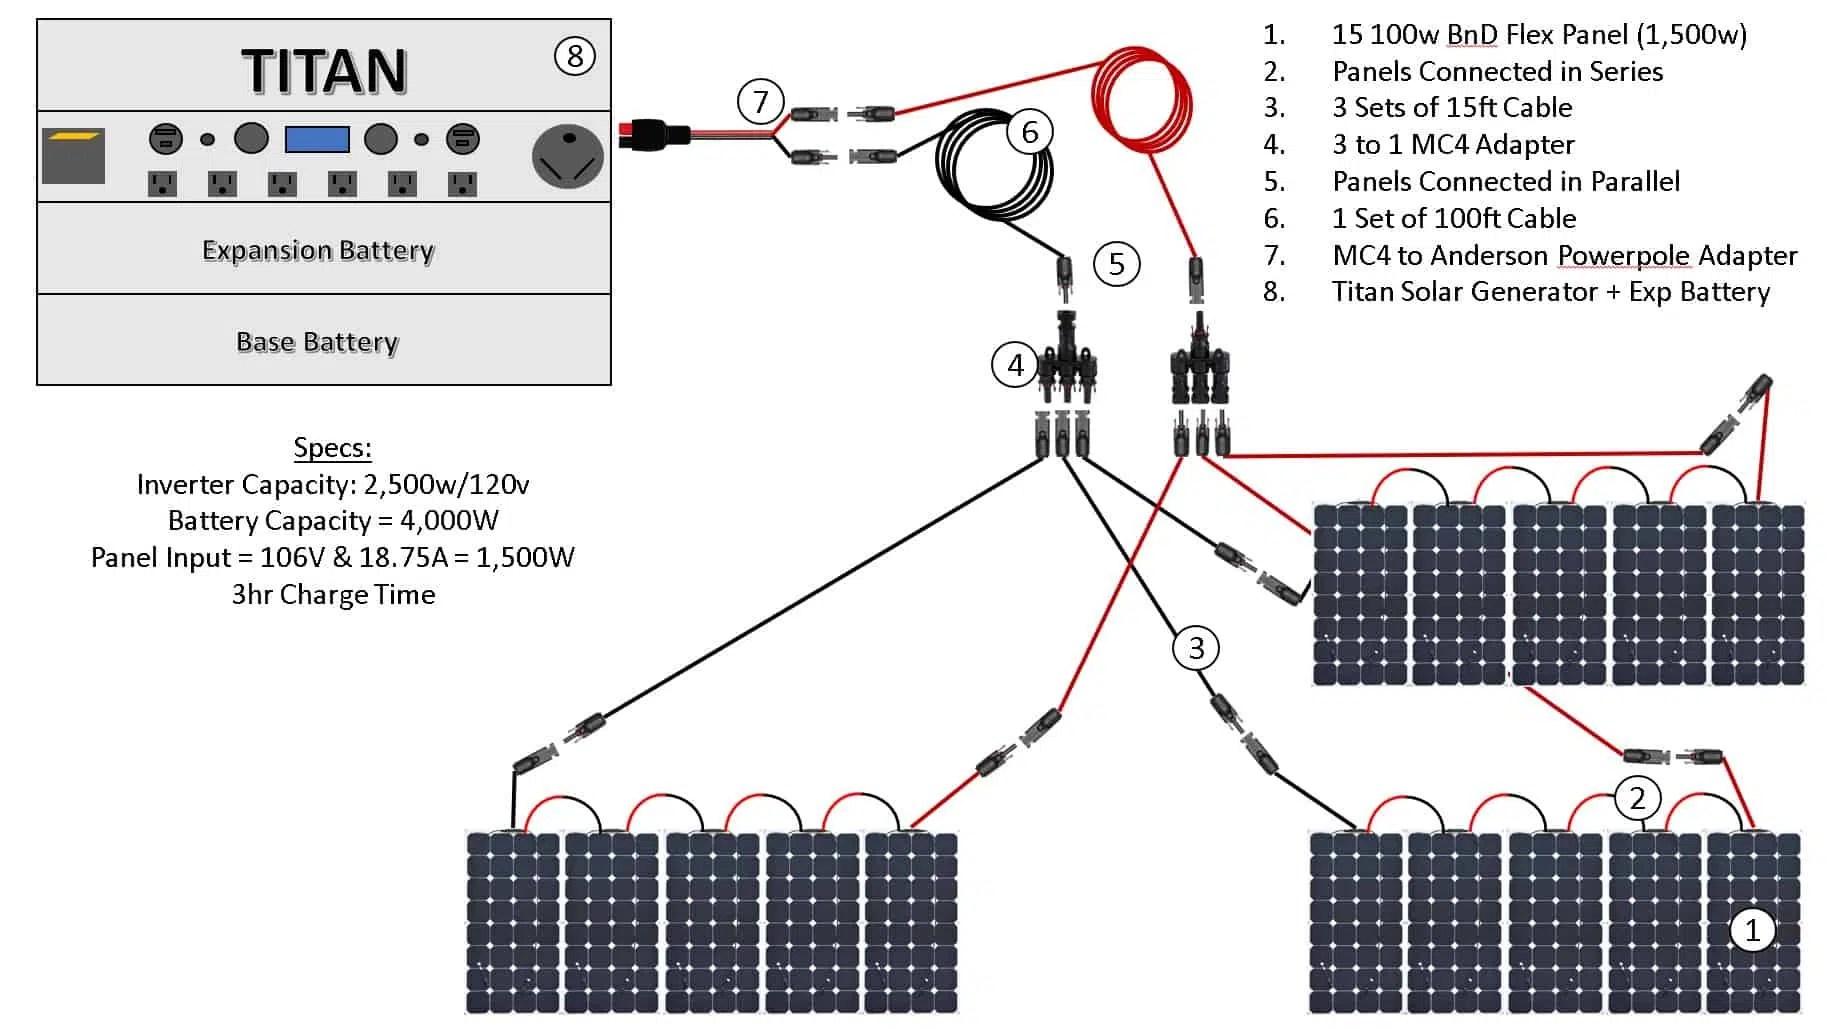 hight resolution of titan 1500 kit diagram